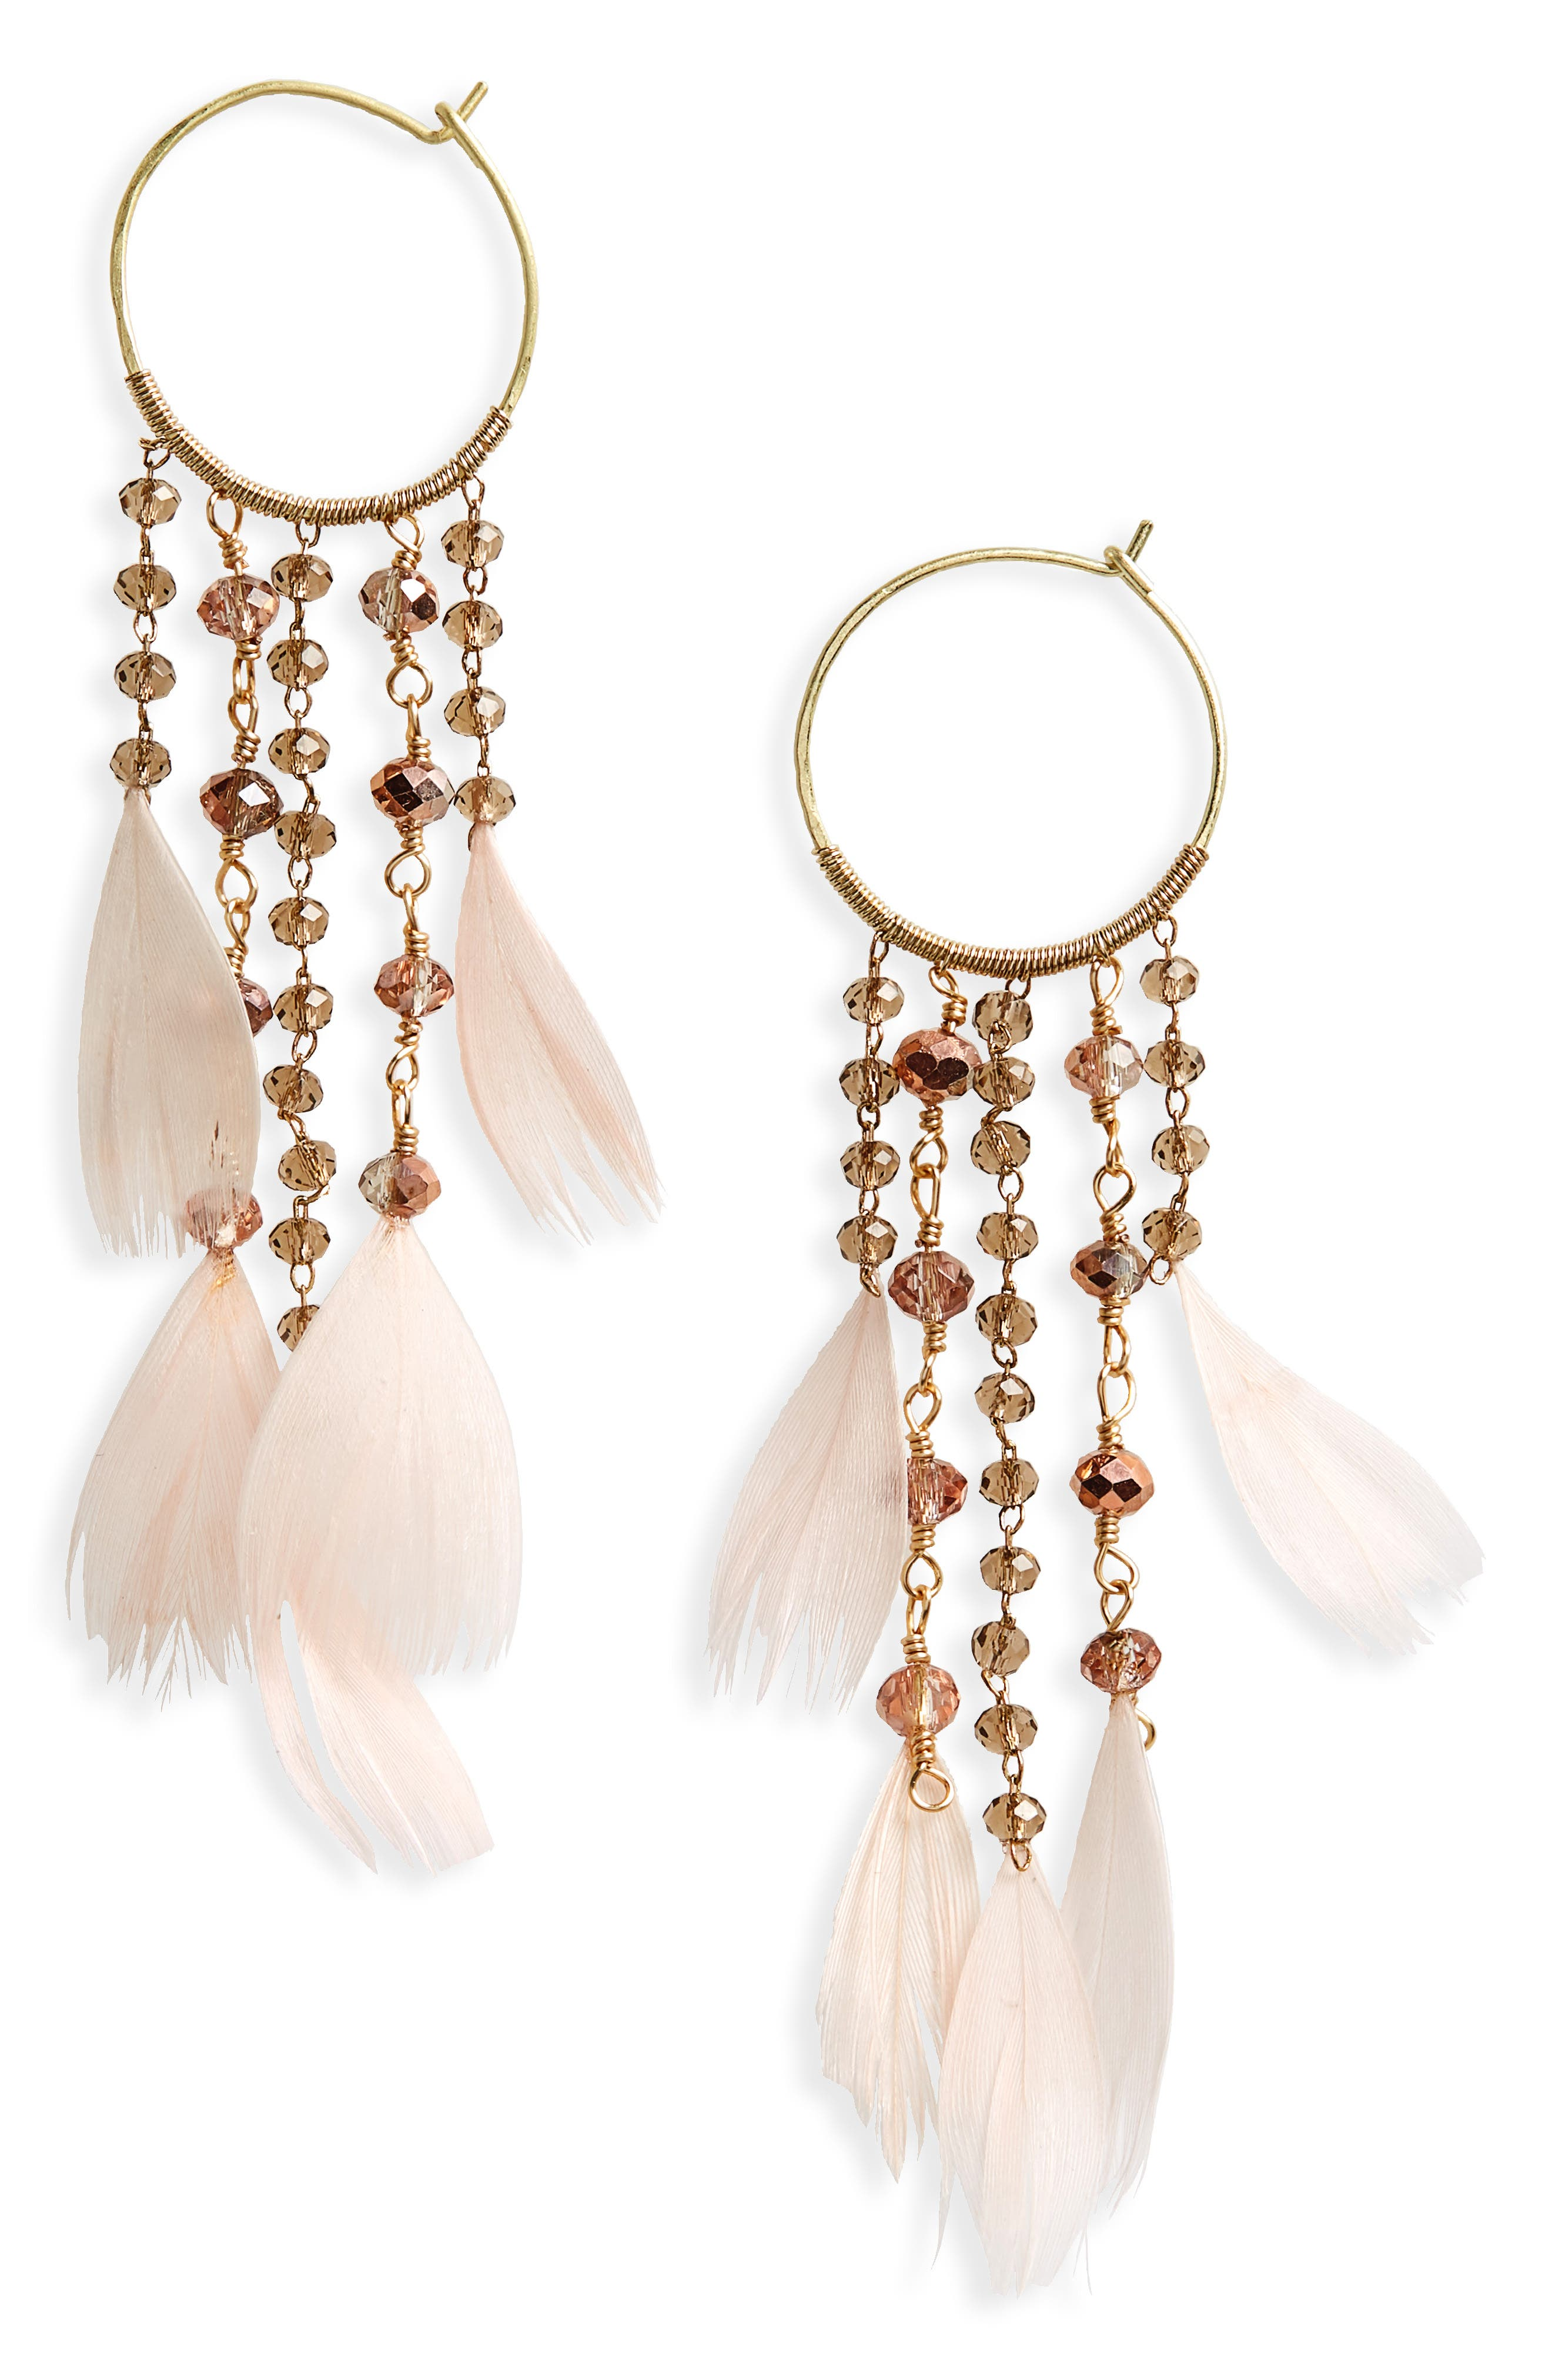 Cascading Crystal & Feather Hoop Earrings,                         Main,                         color,